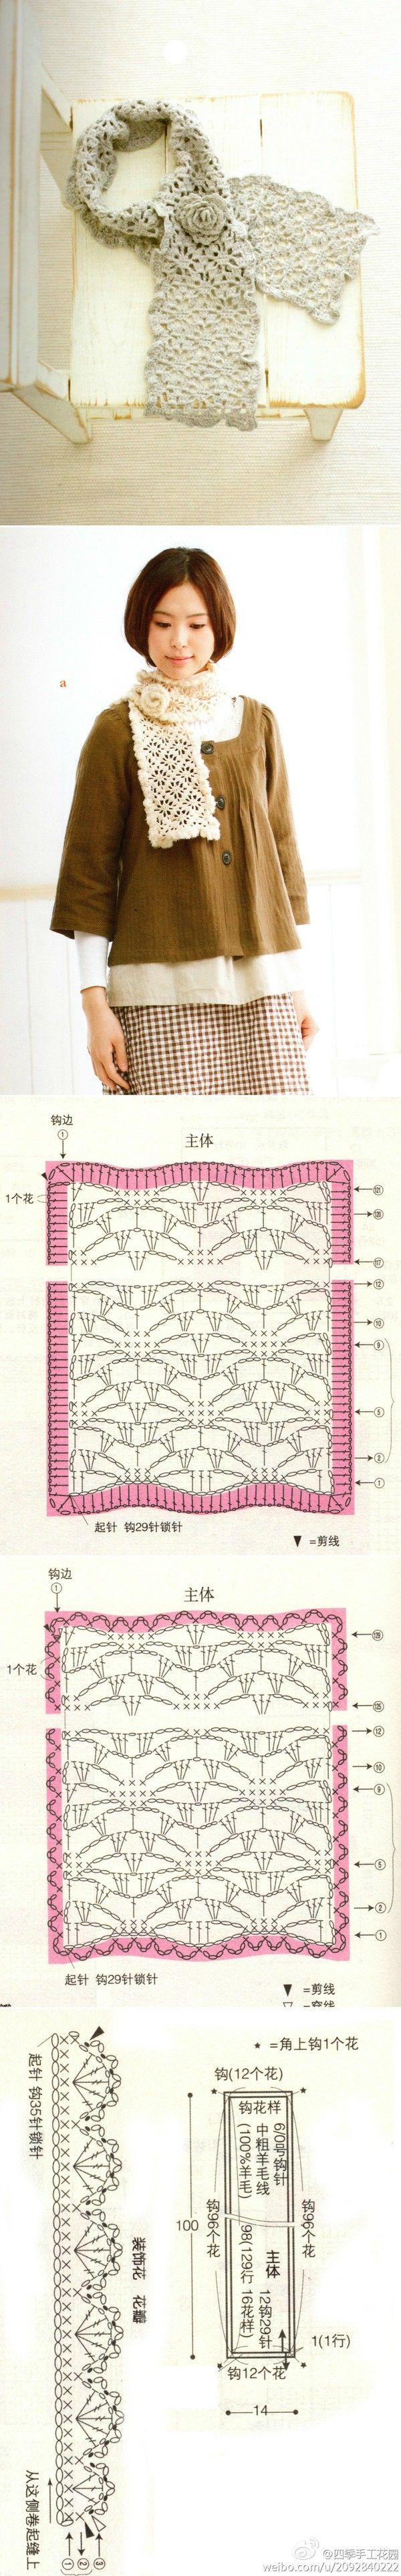 b-u-t-ful crochet lace scarf